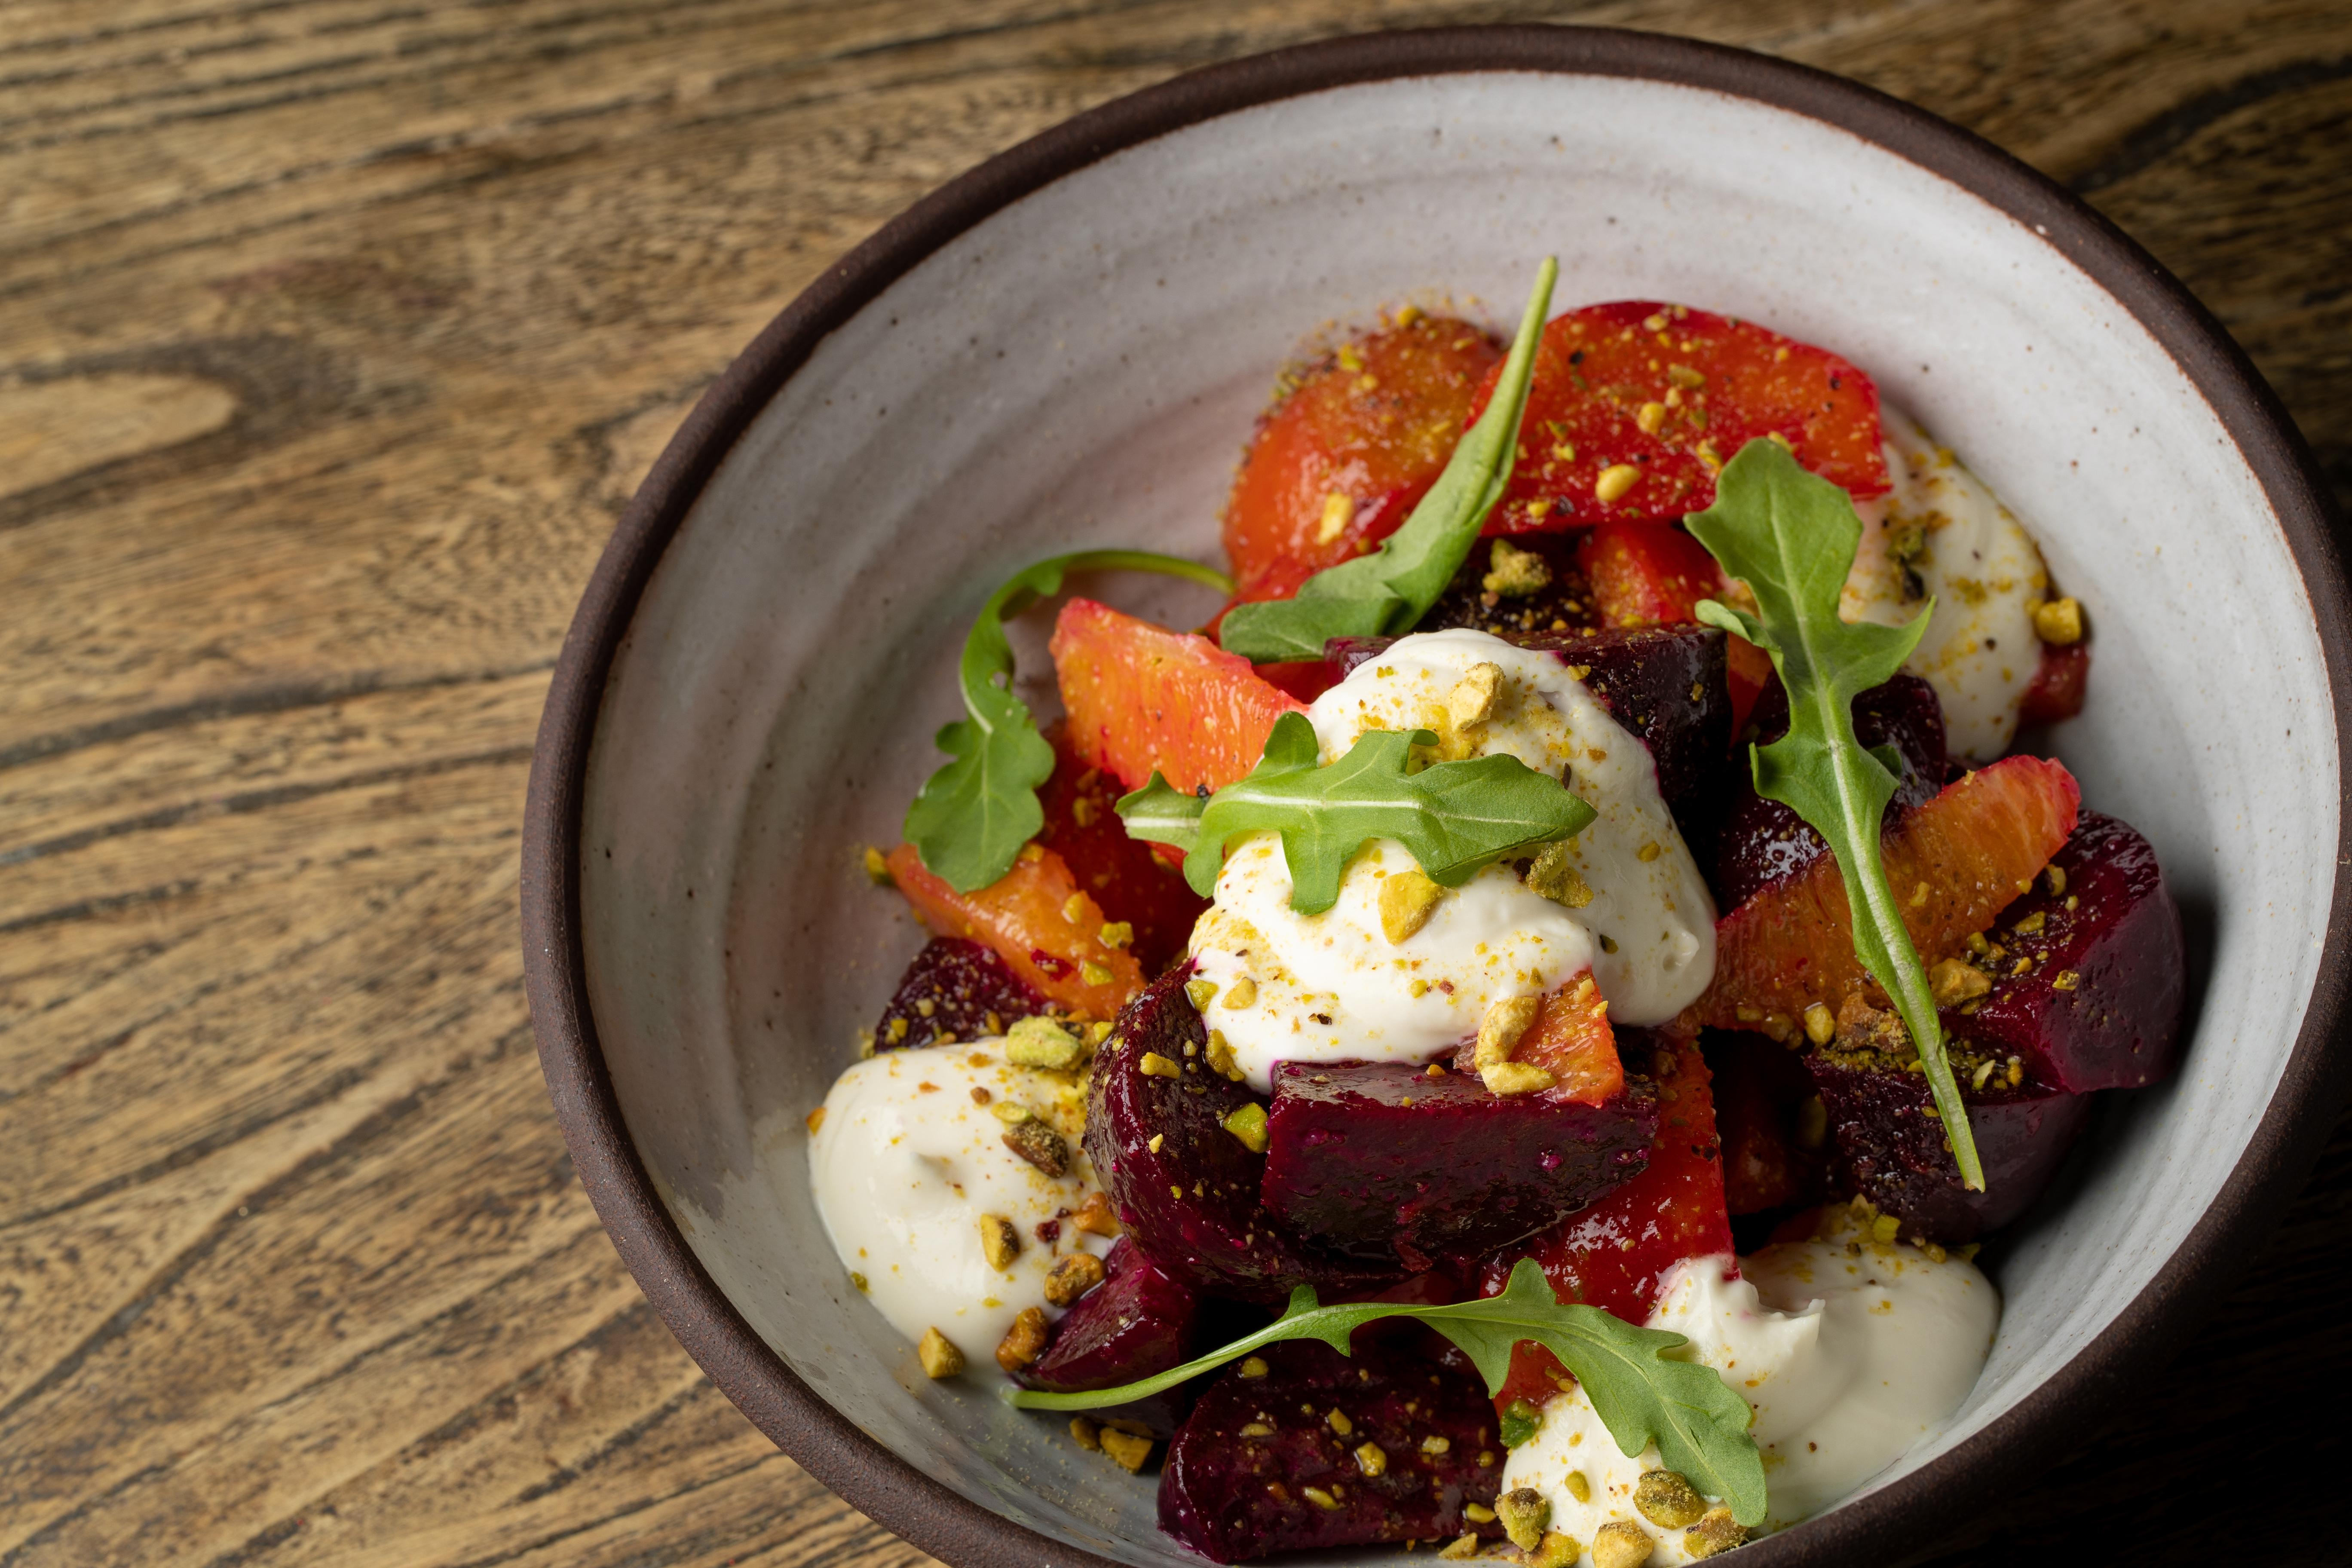 beet salad hearthstone